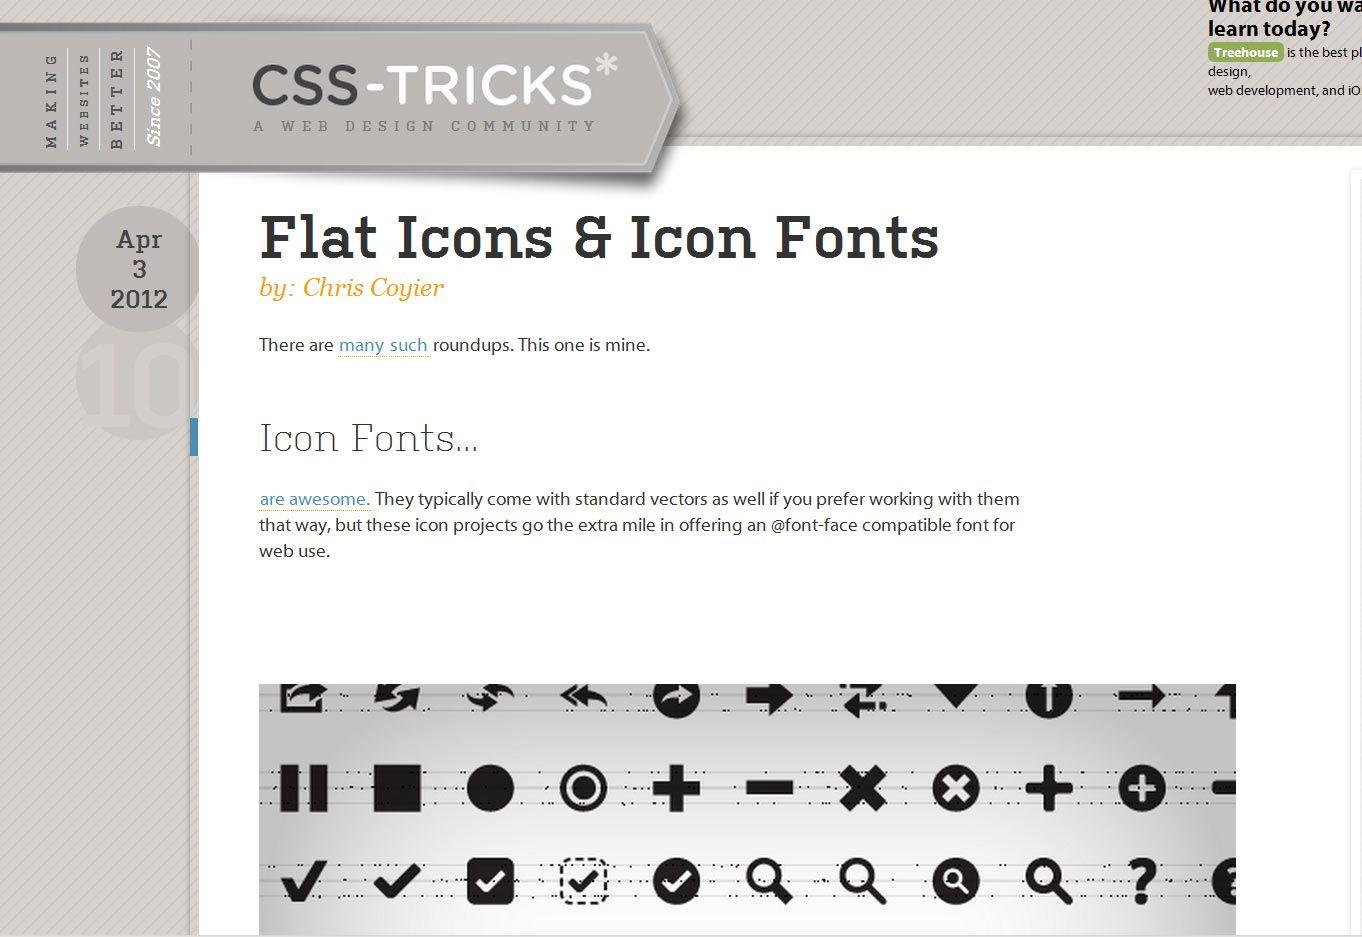 via icon fonts Web design tools